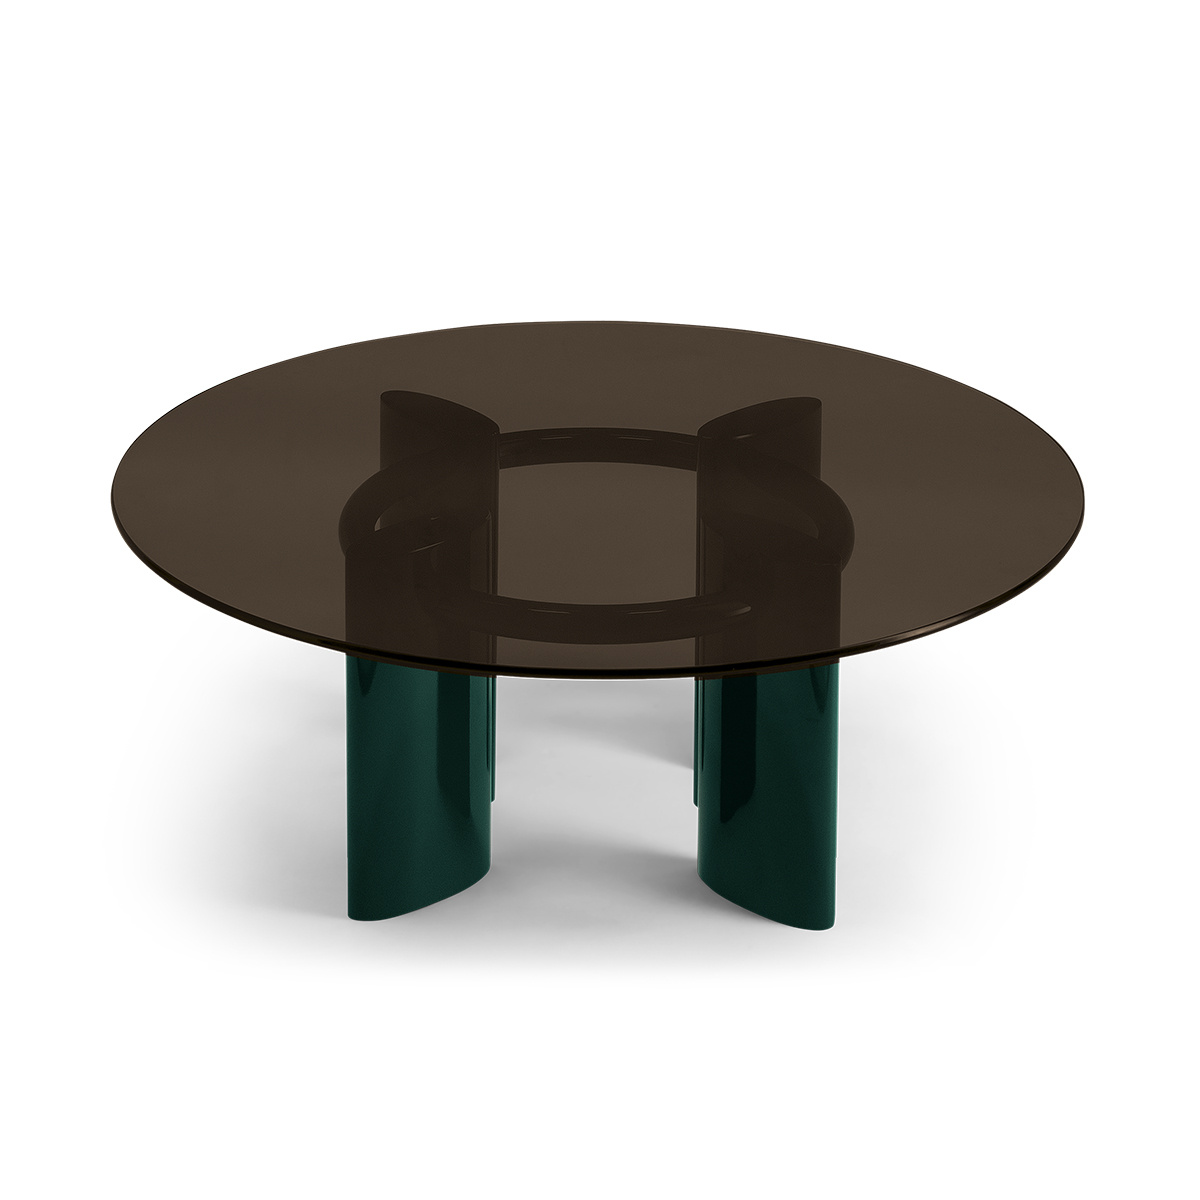 Table basse Carlotta pieds laques vert et verre